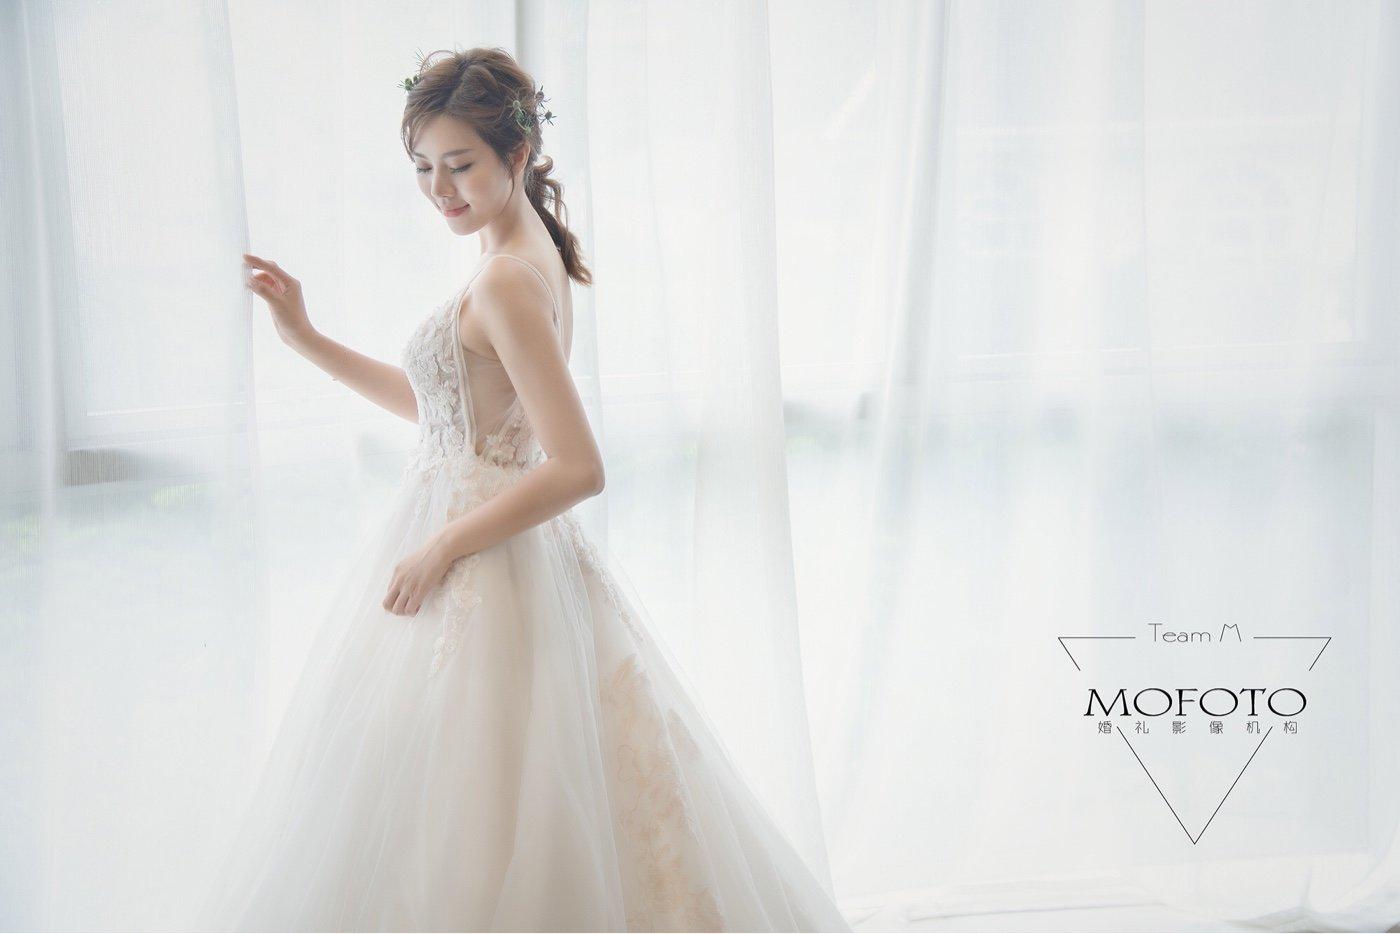 MoFoTo 婚礼拍摄0